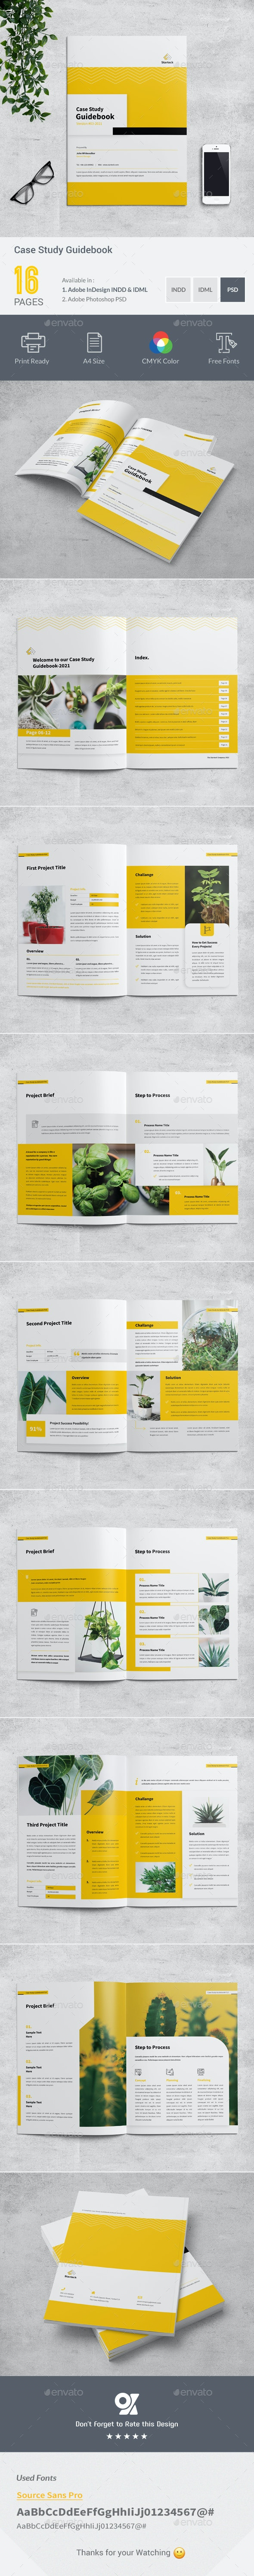 Case Study Guidebook - Informational Brochures